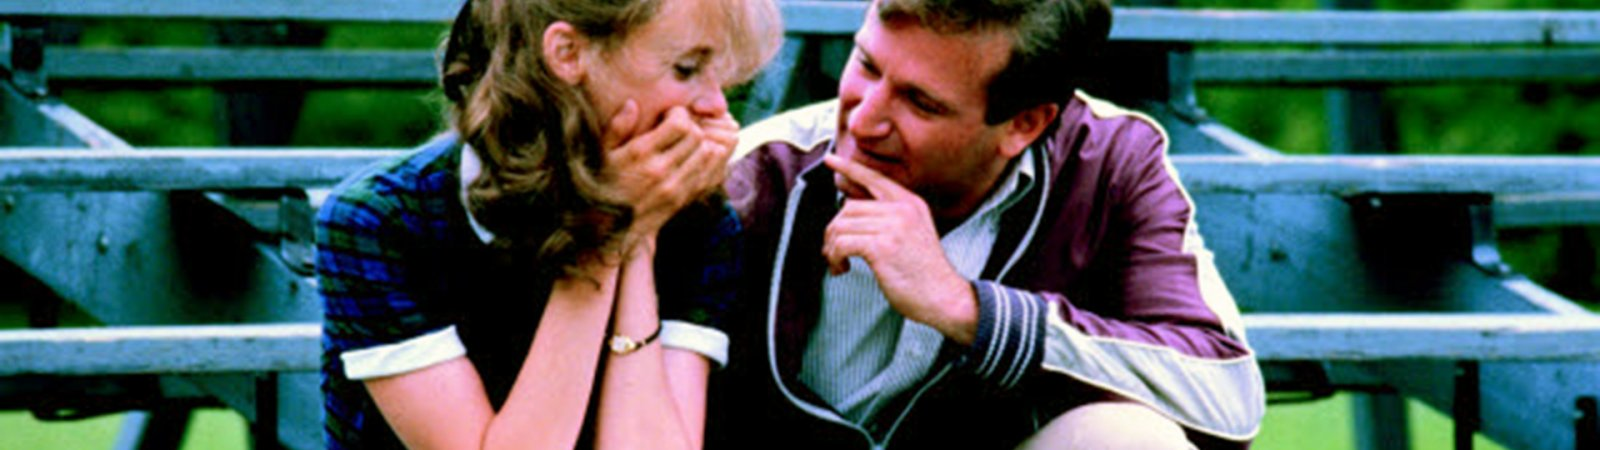 Photo du film : Le monde selon garp